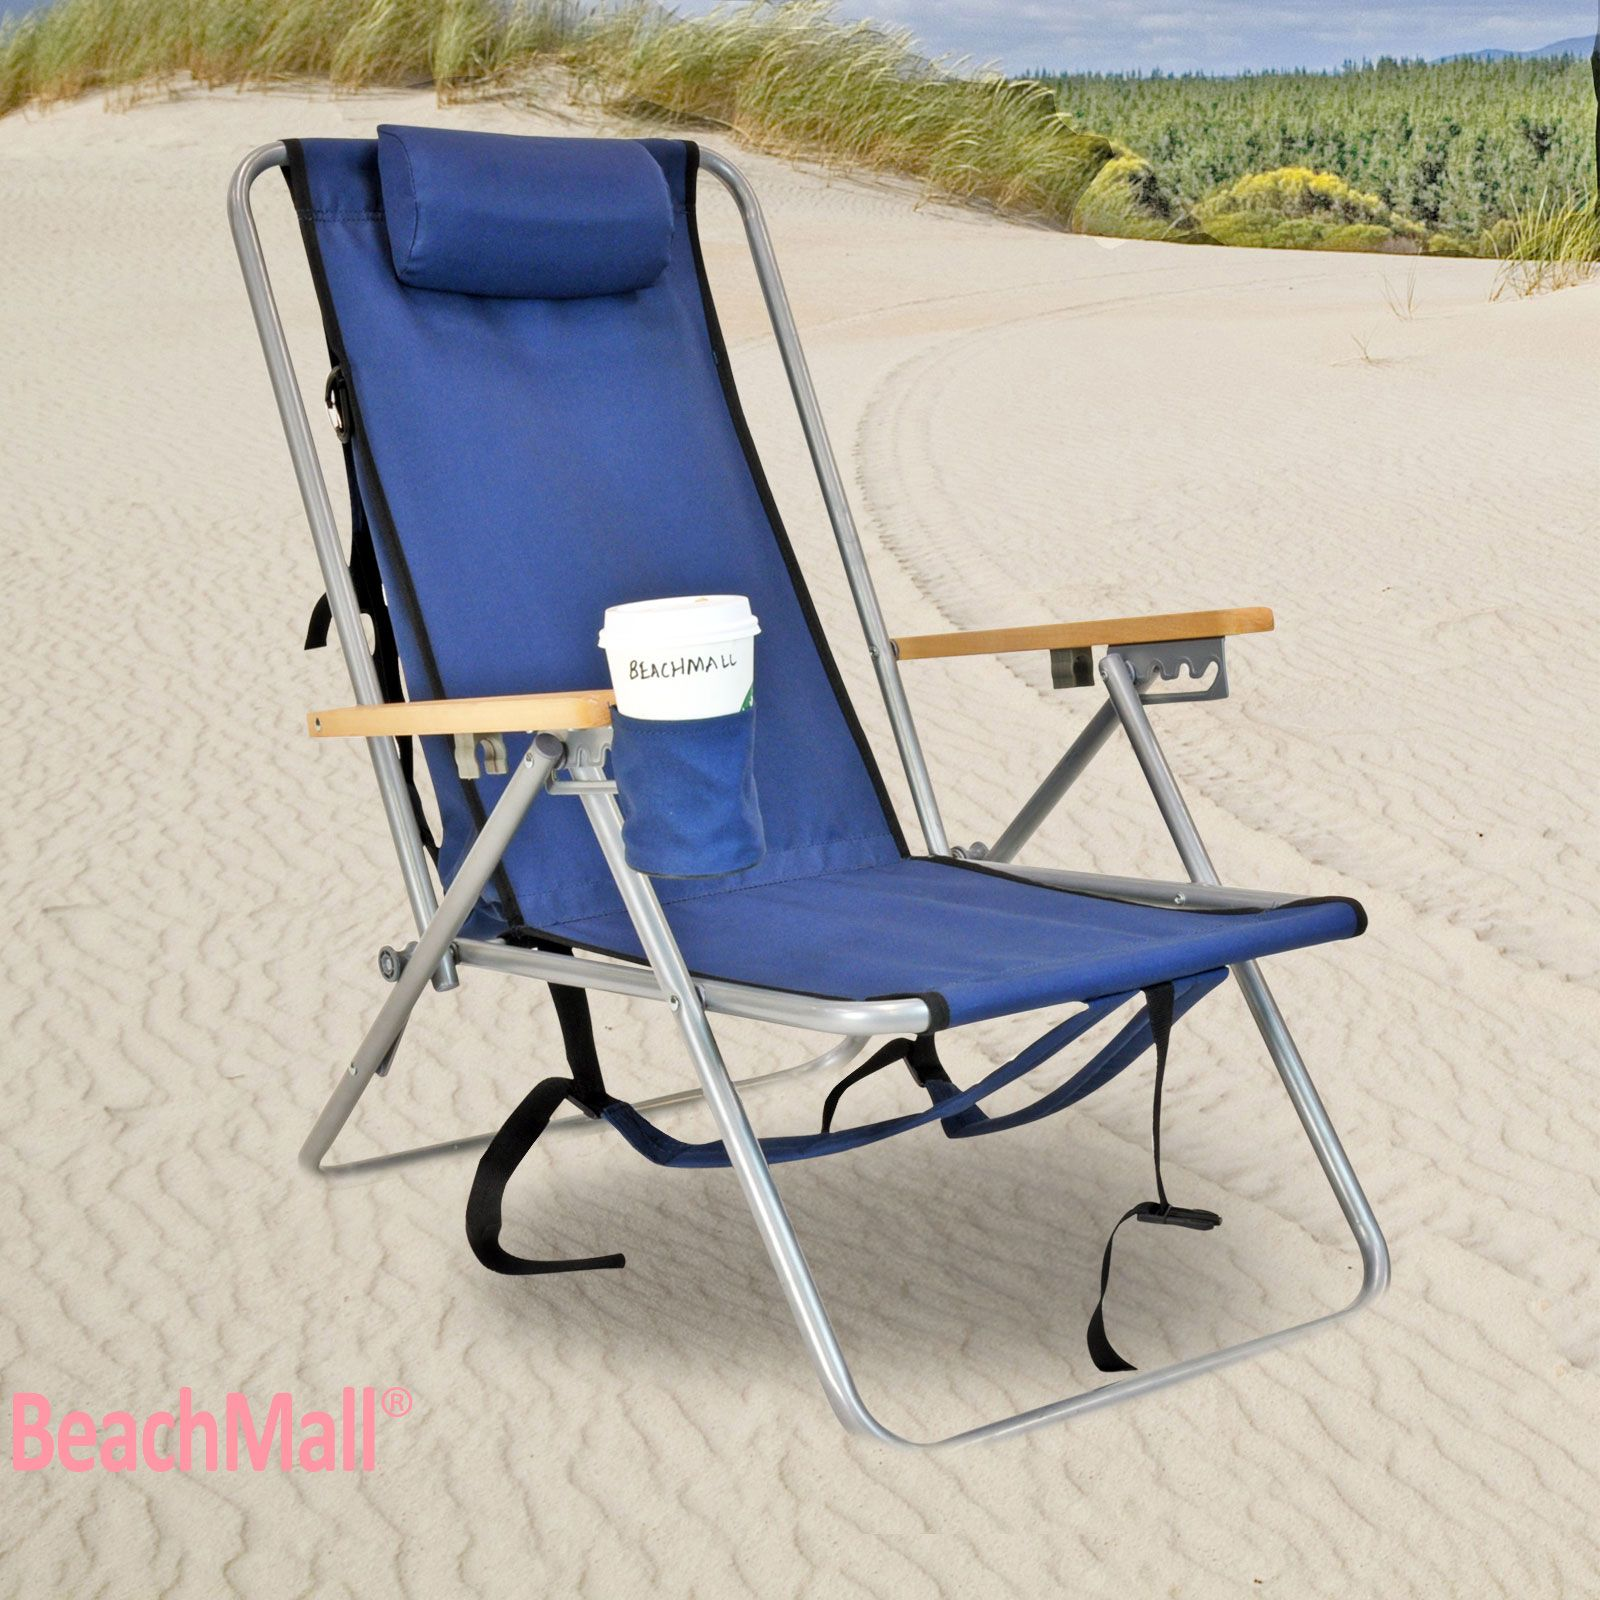 Fine Pin By Beachmall Com On Backpack Chairs Beach Chairs Frankydiablos Diy Chair Ideas Frankydiabloscom